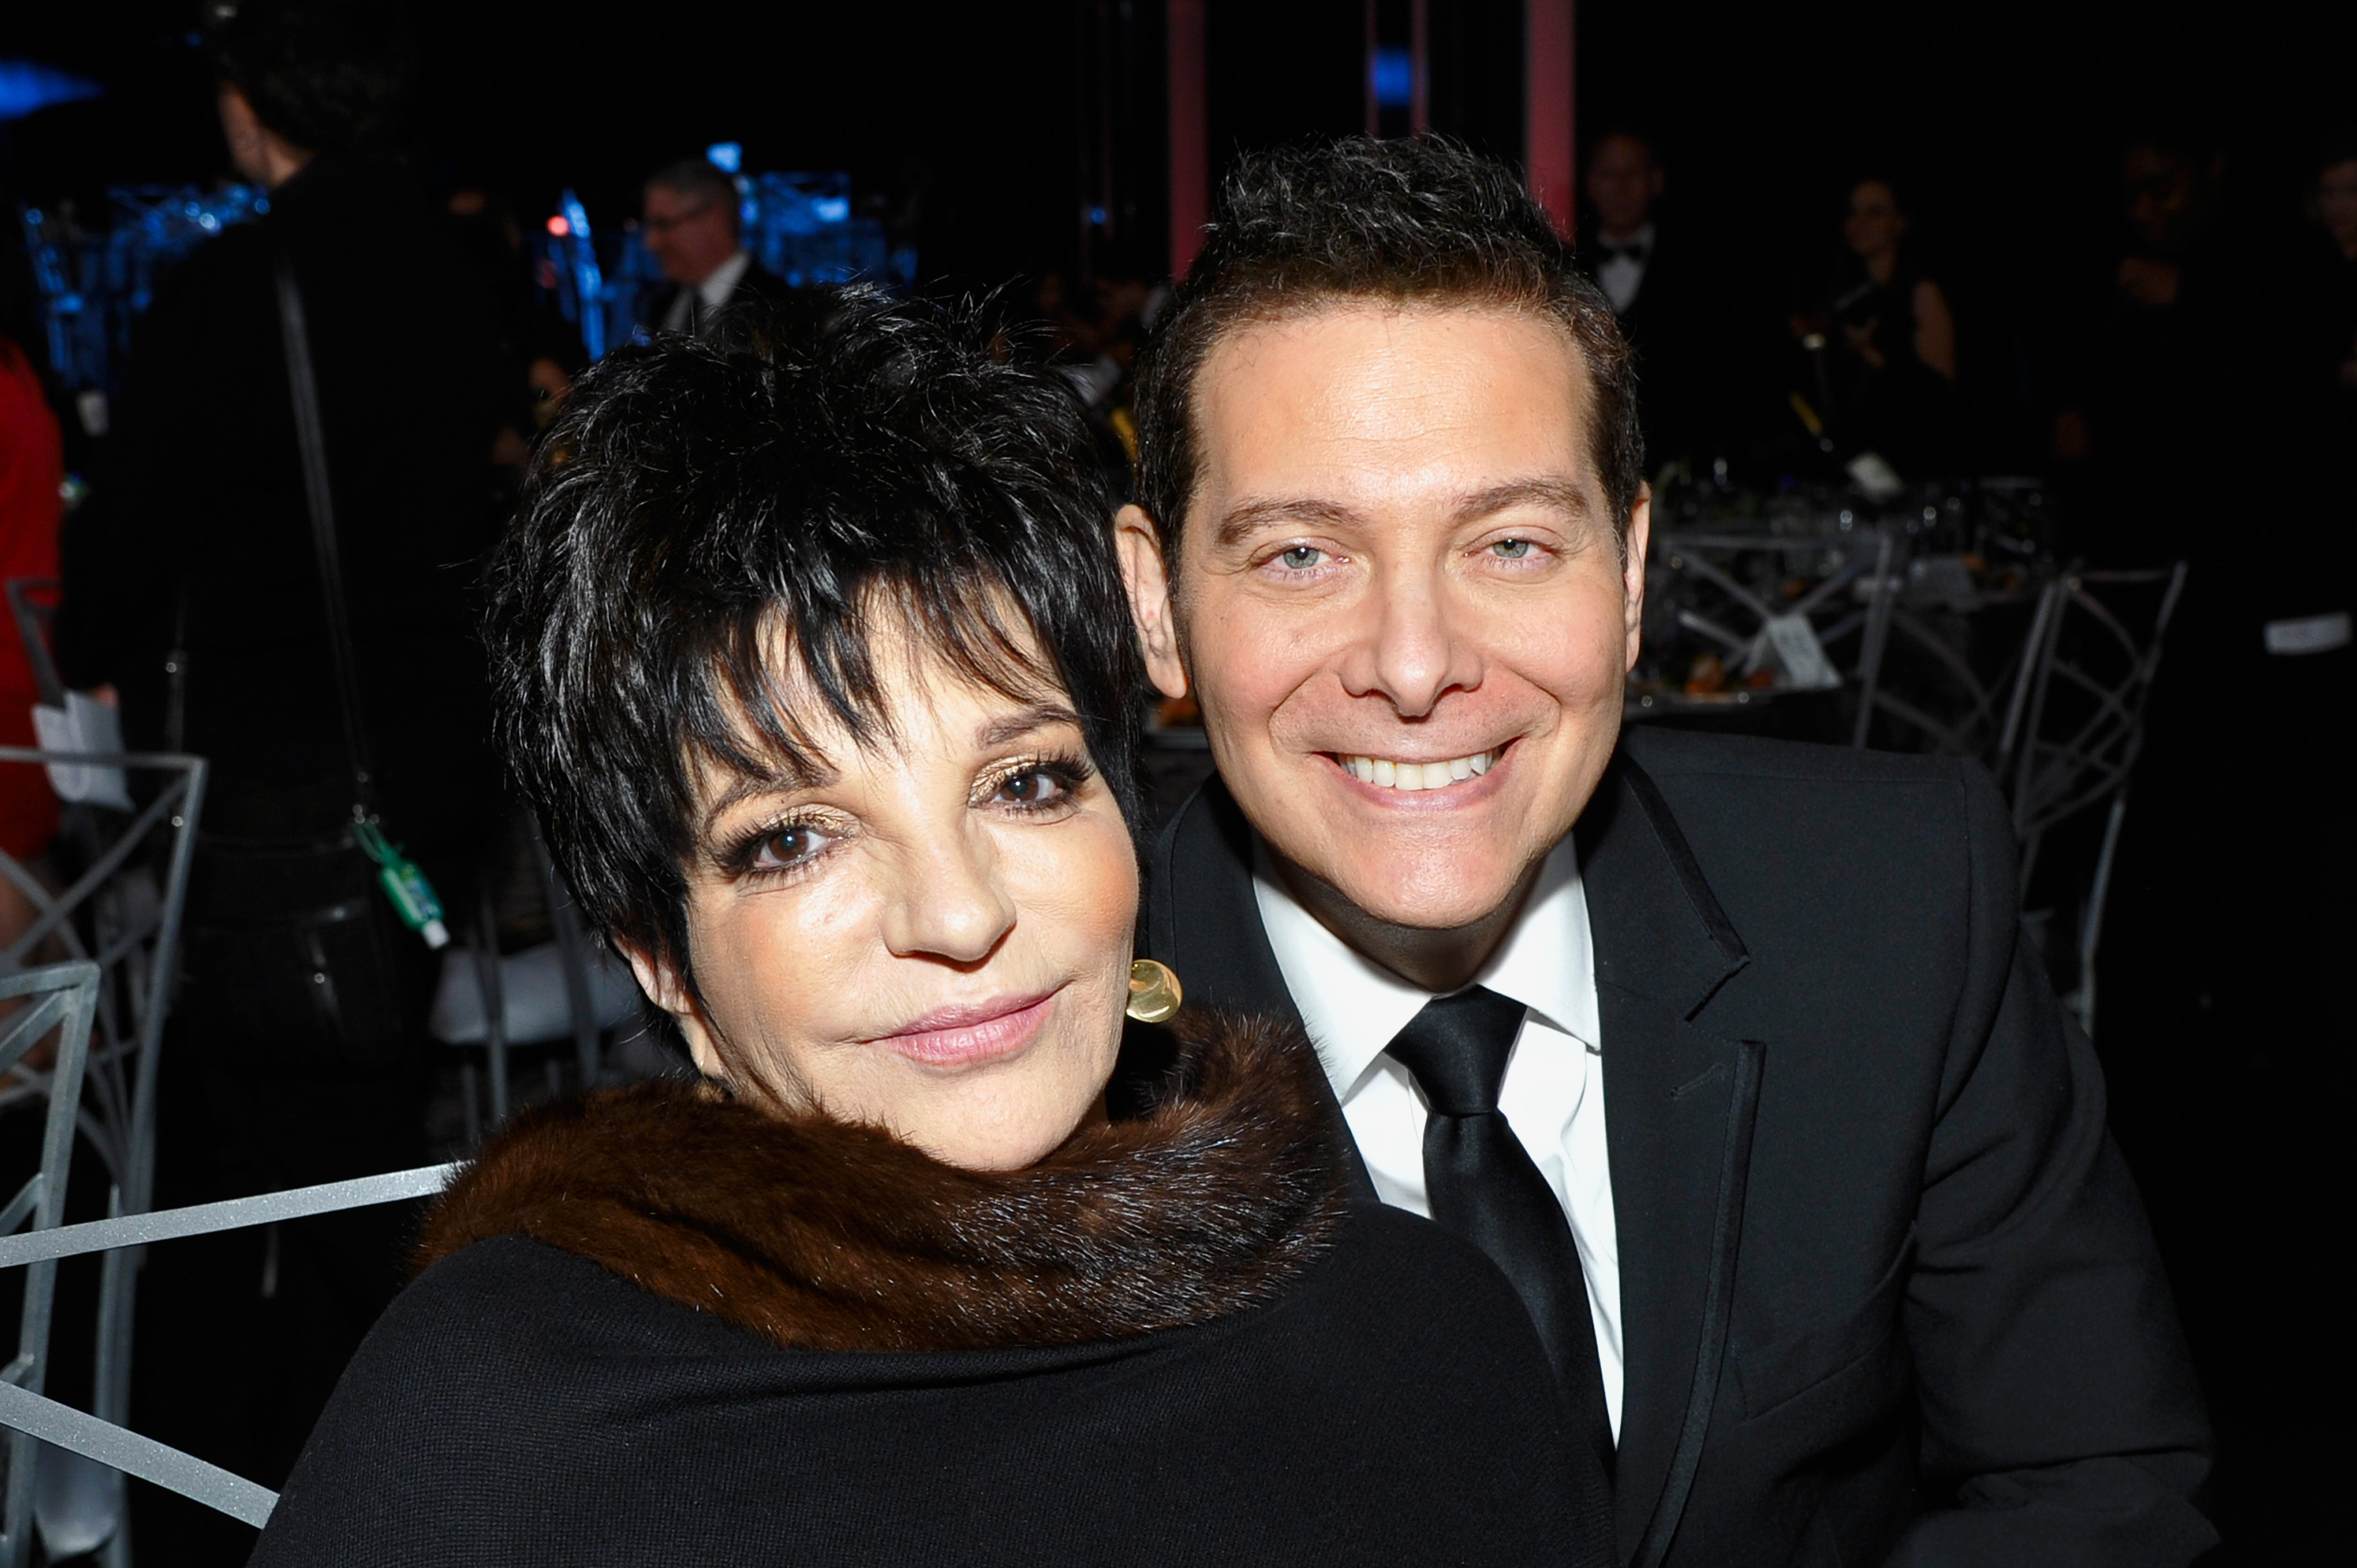 Liza Minnelli and Michael Feinstein